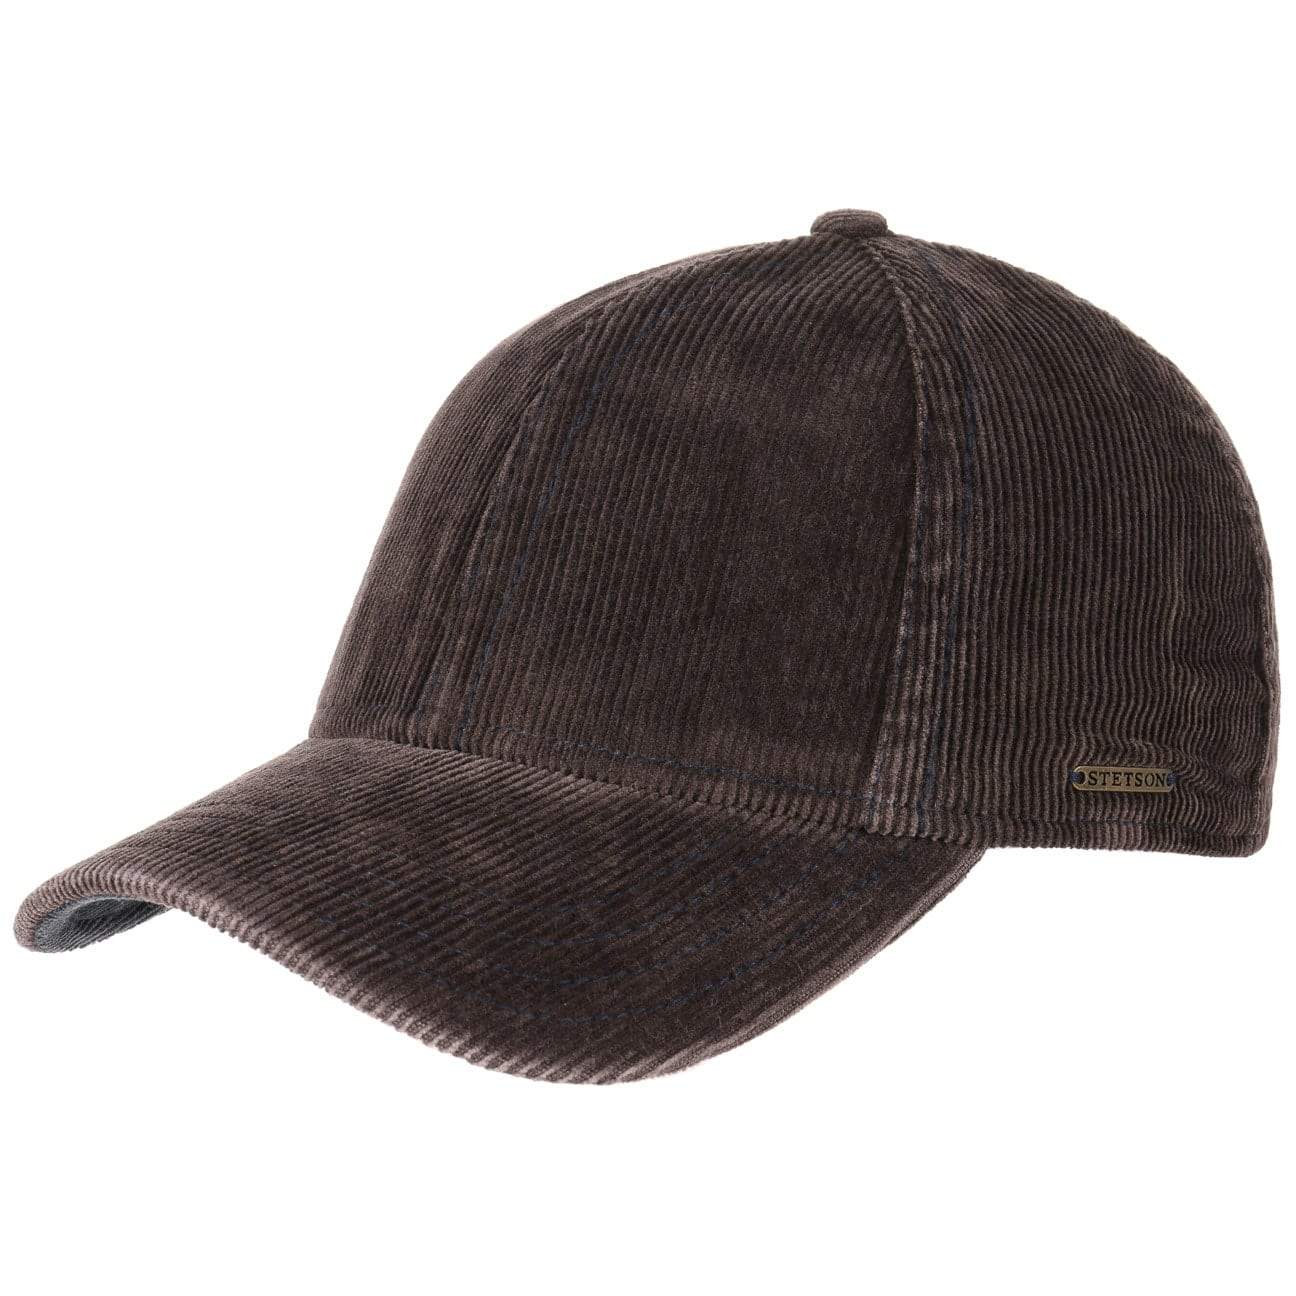 plano-corduroy-cap-by-stetson-baumwollcap